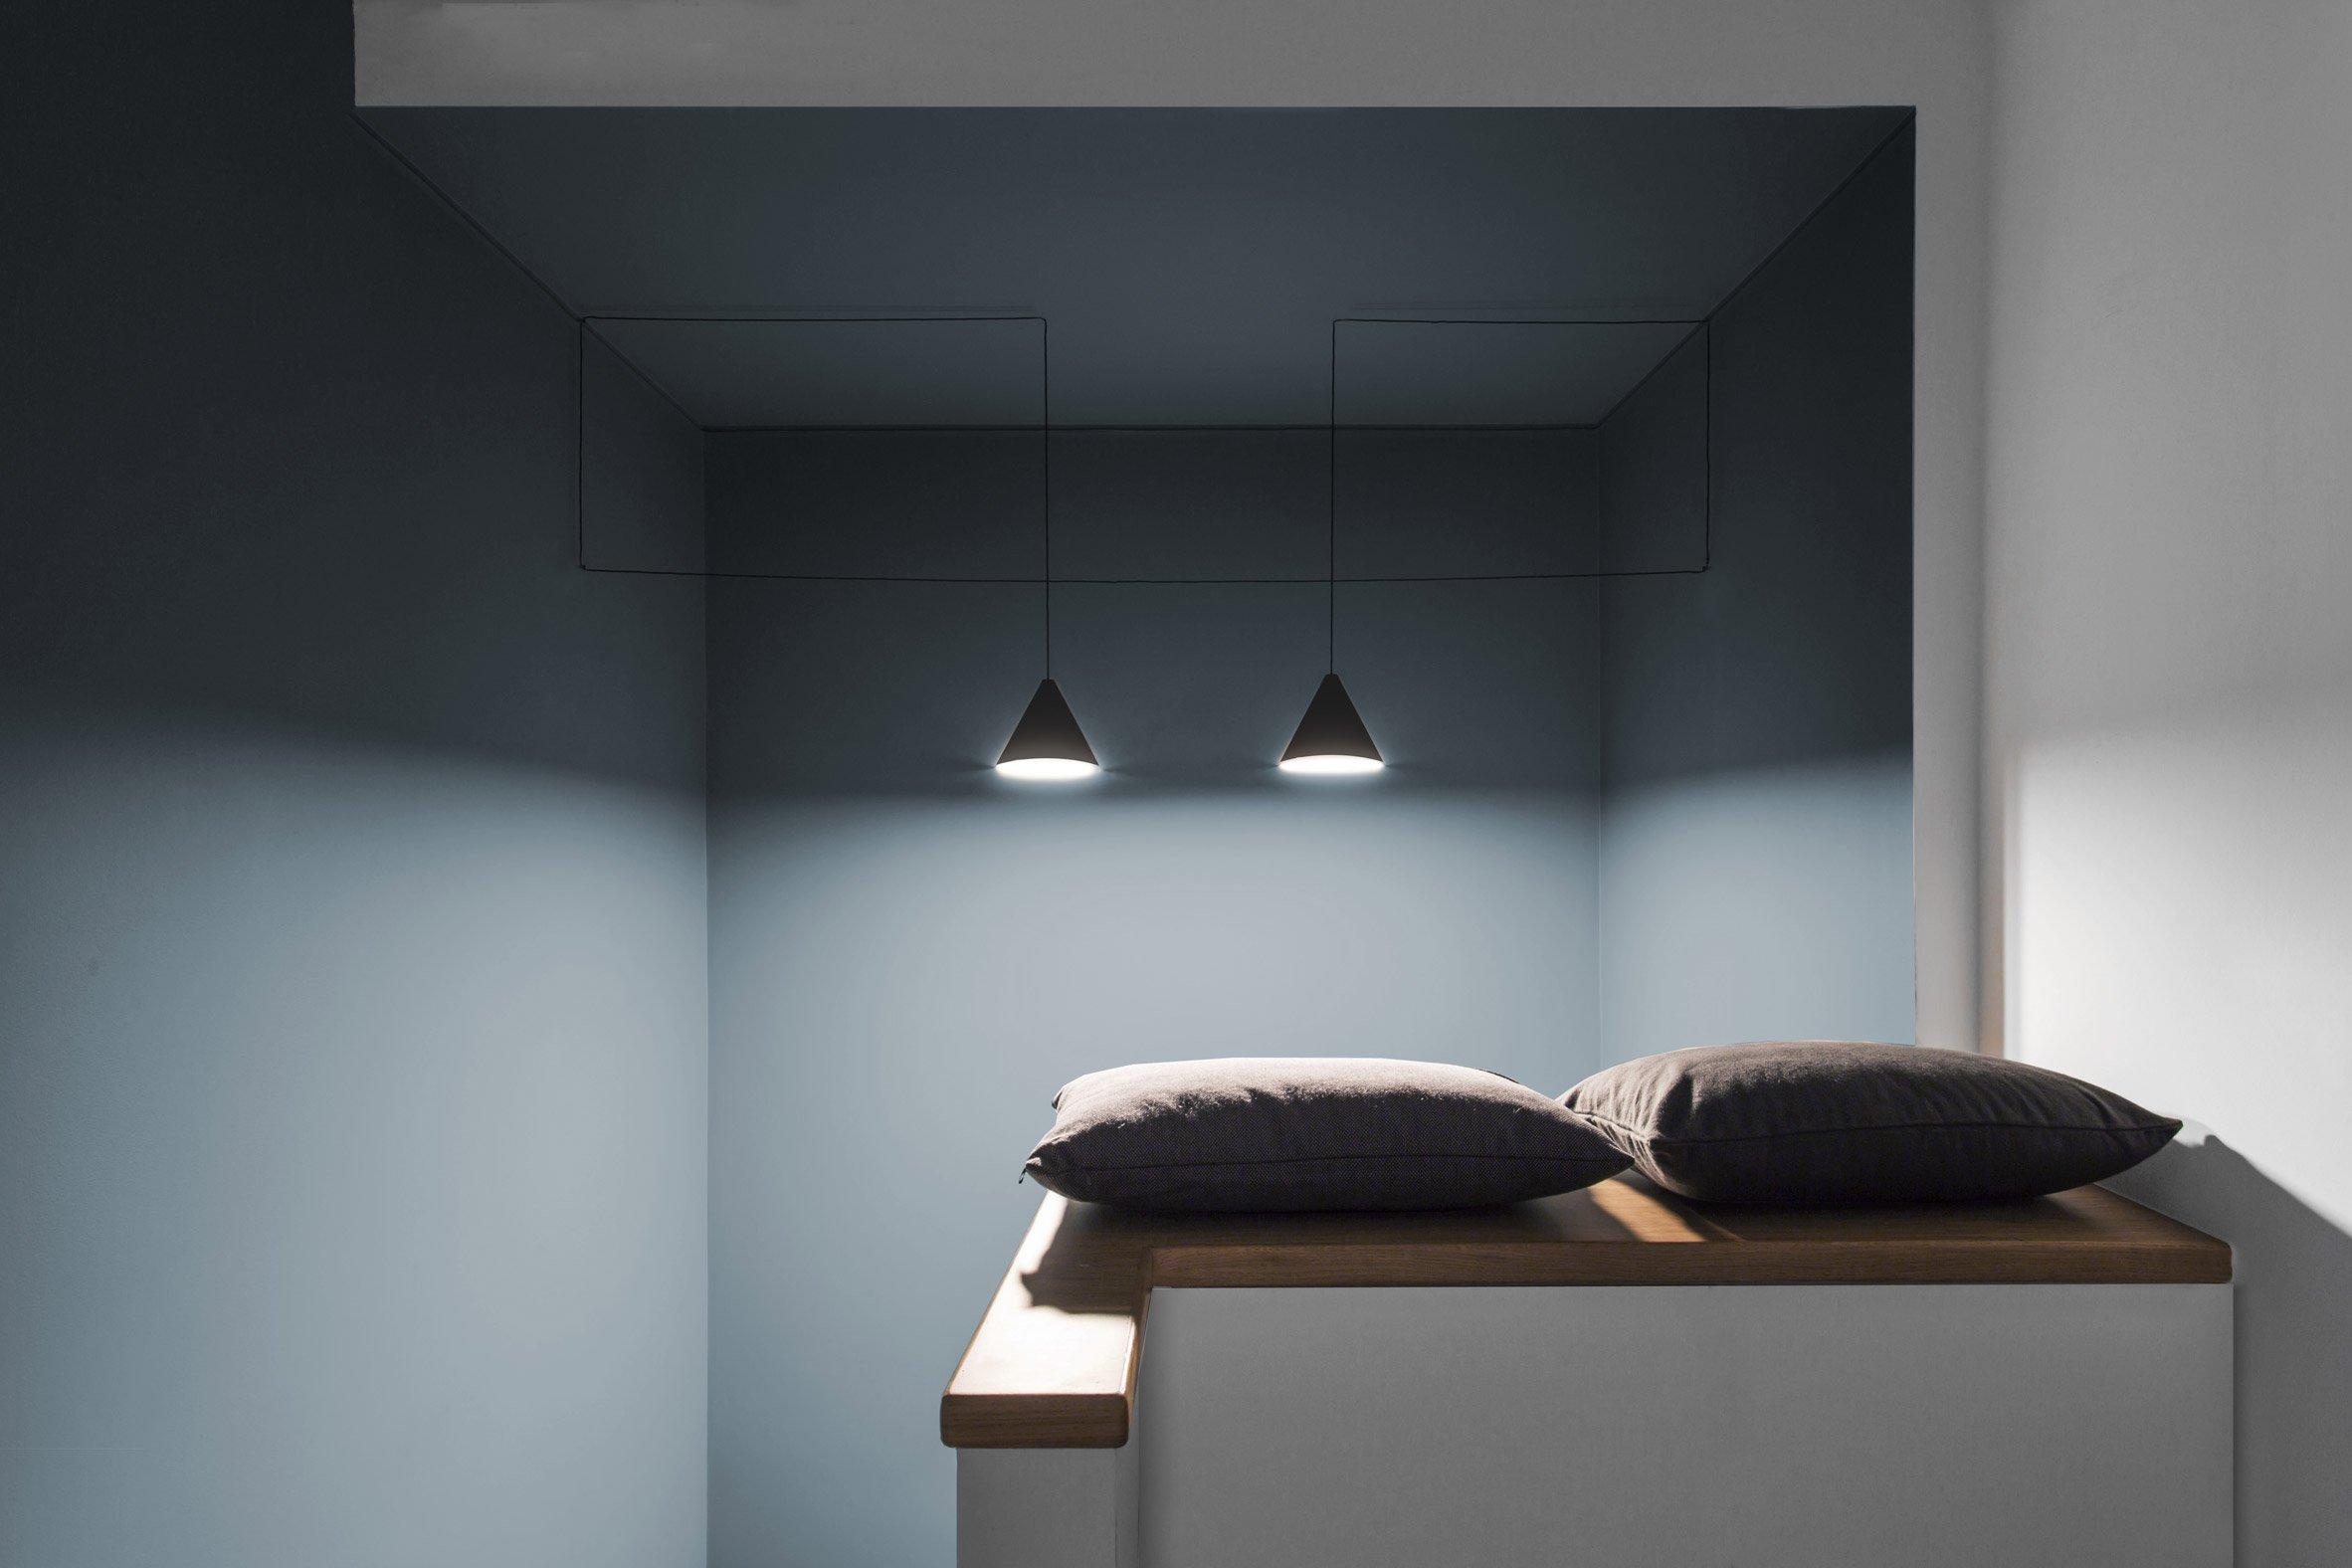 architecture-house-residential-design-studia-interiors-osnovadesign-osnova-poltava_16